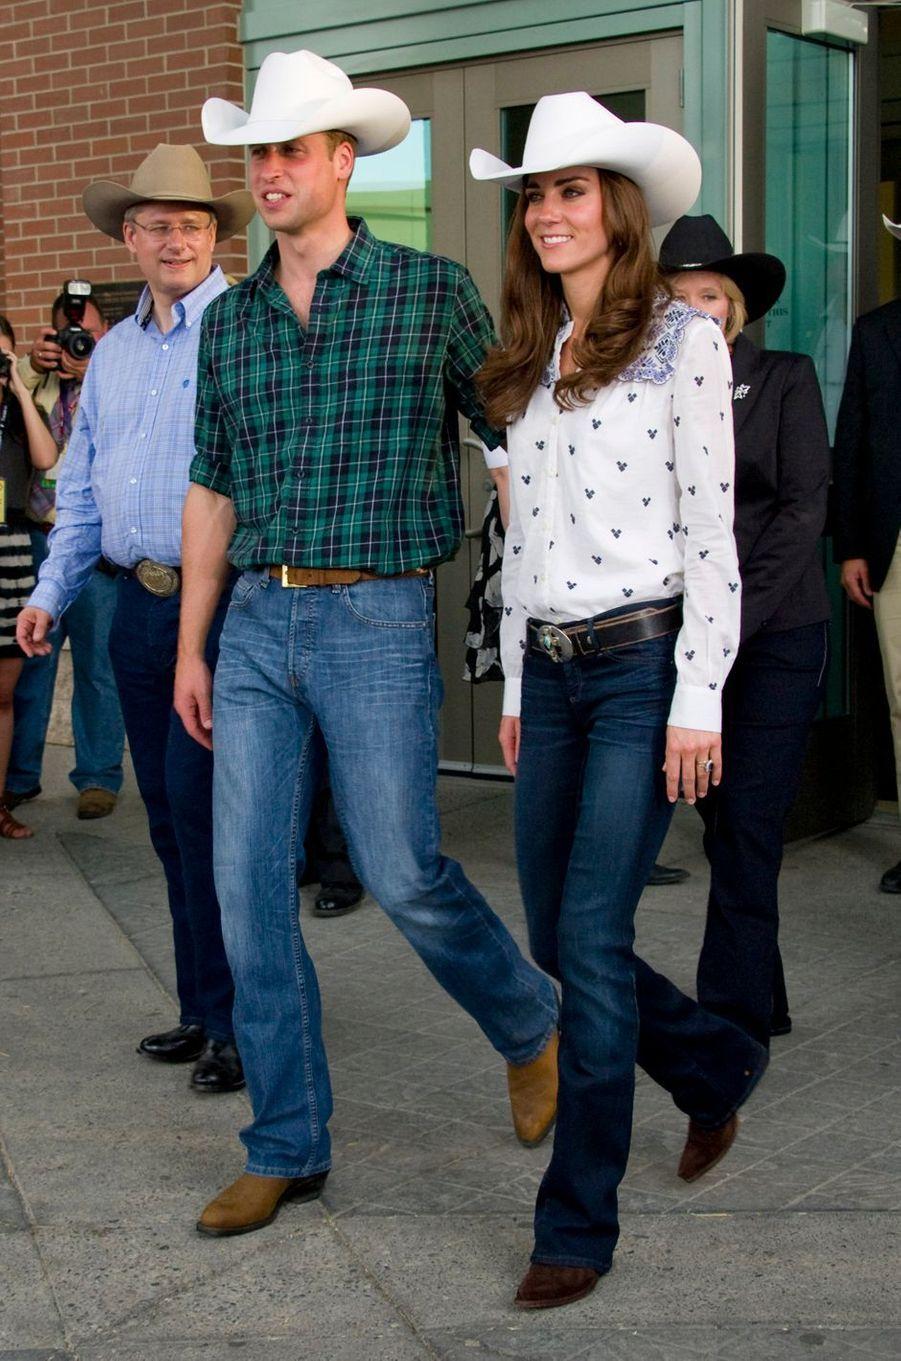 Le prince William et duchesse Catherine de Cambridge au Canada, le 7 juillet 2011